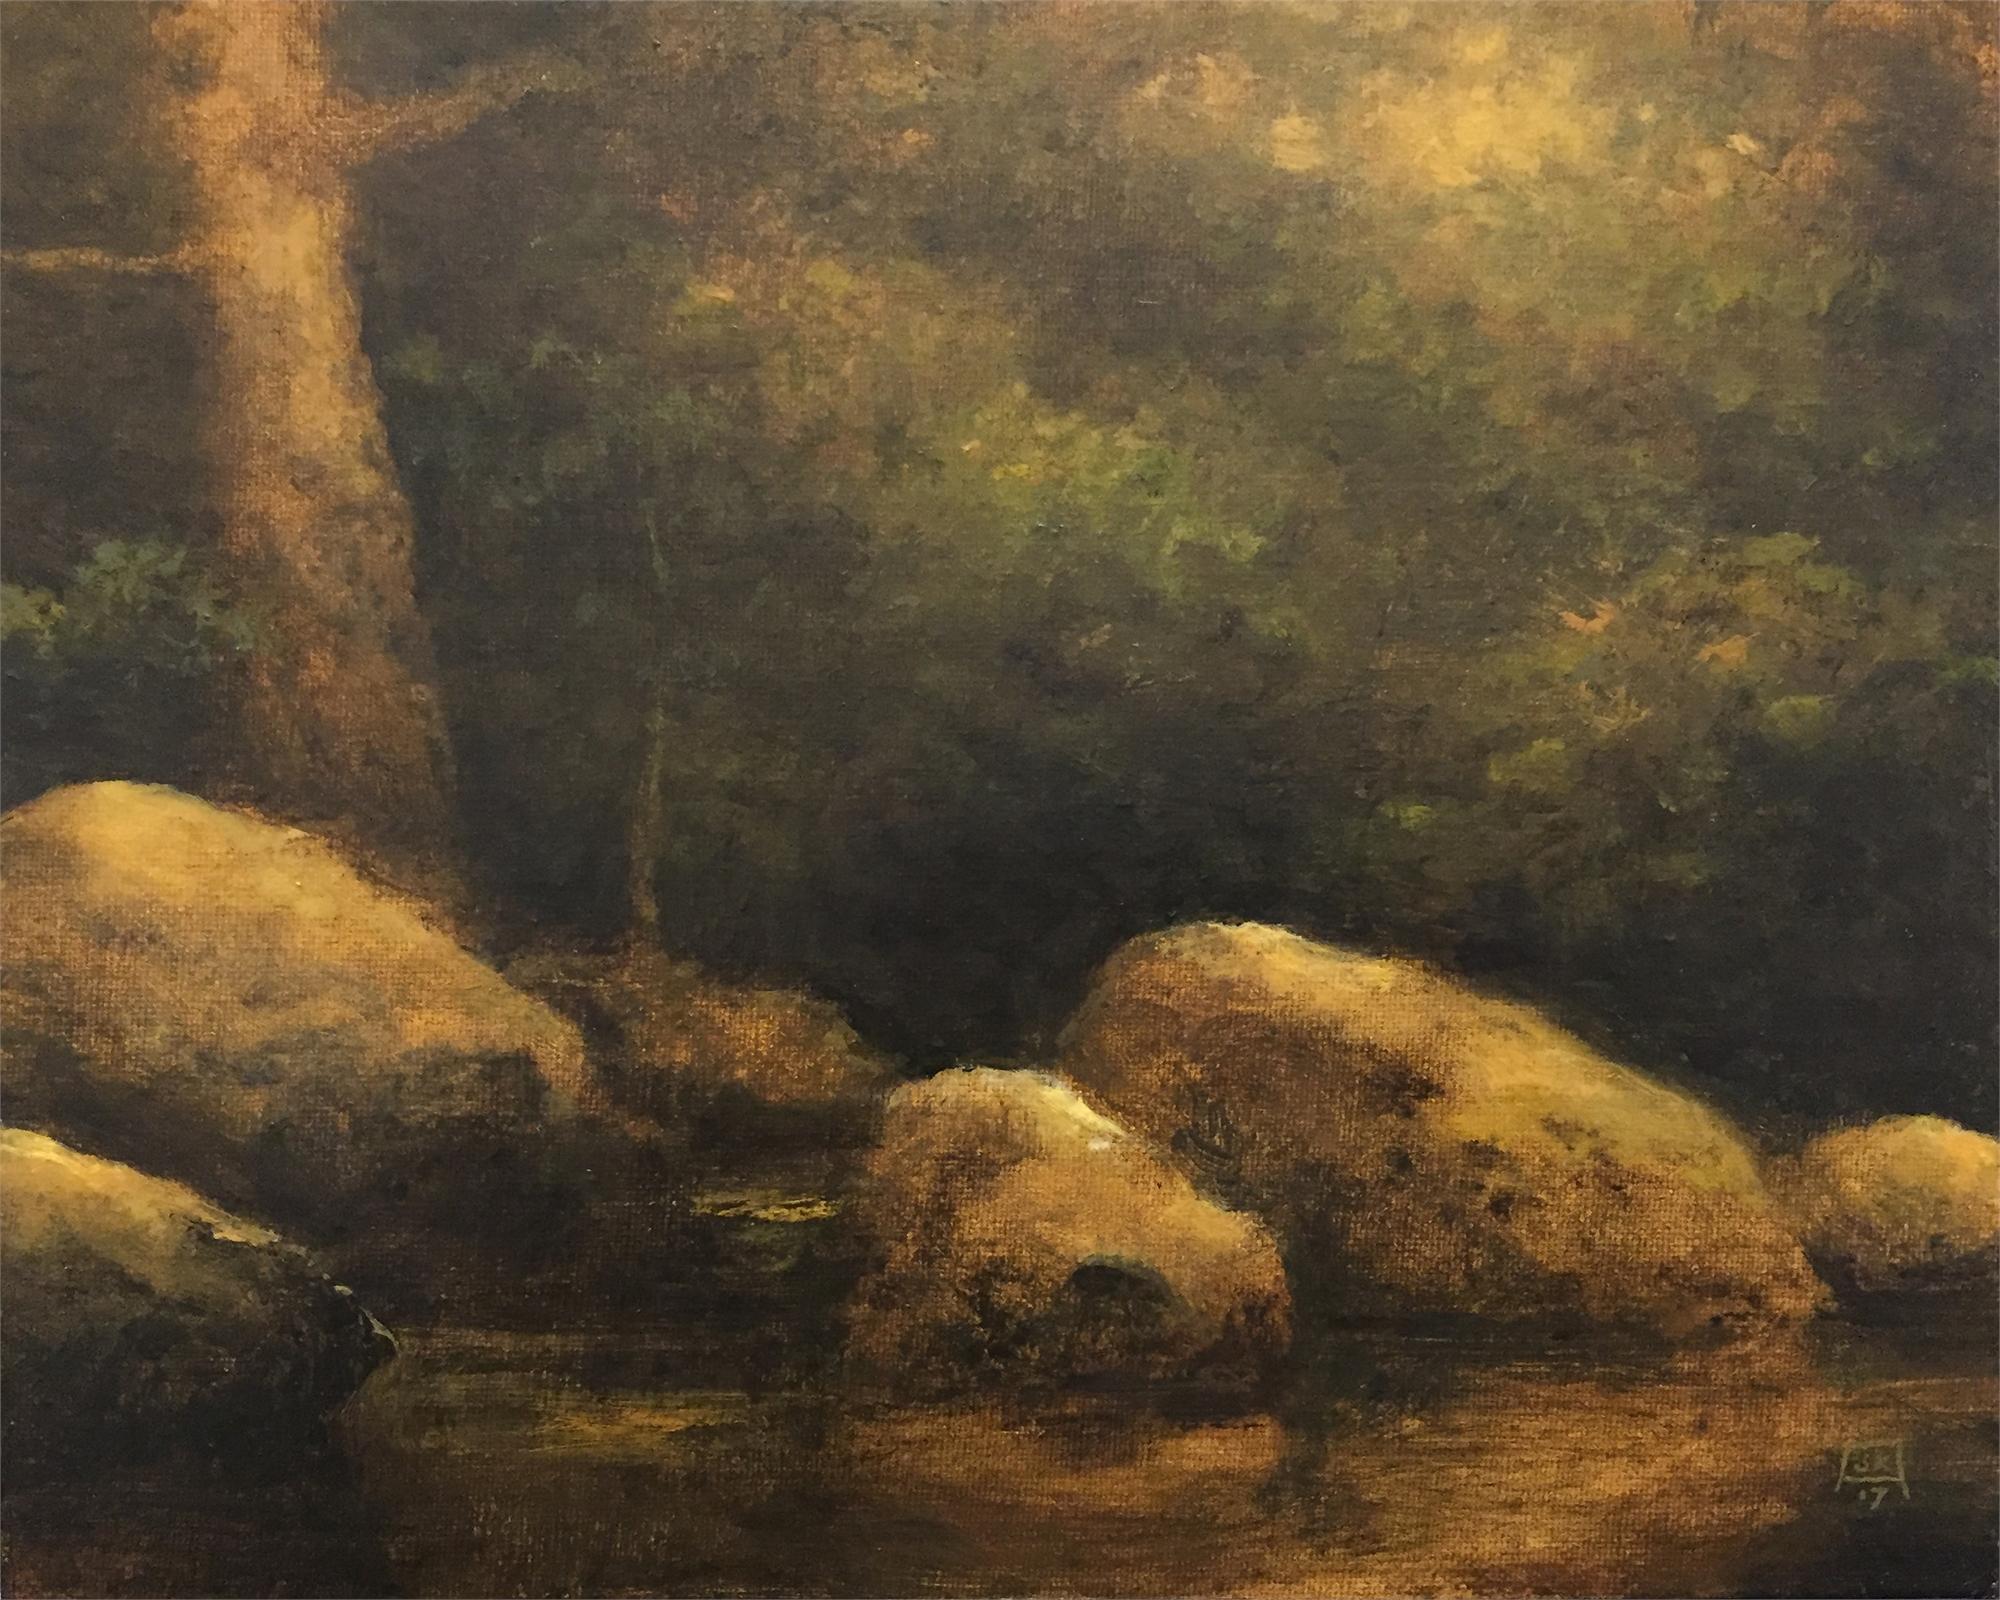 A Backwater by Shawn Krueger